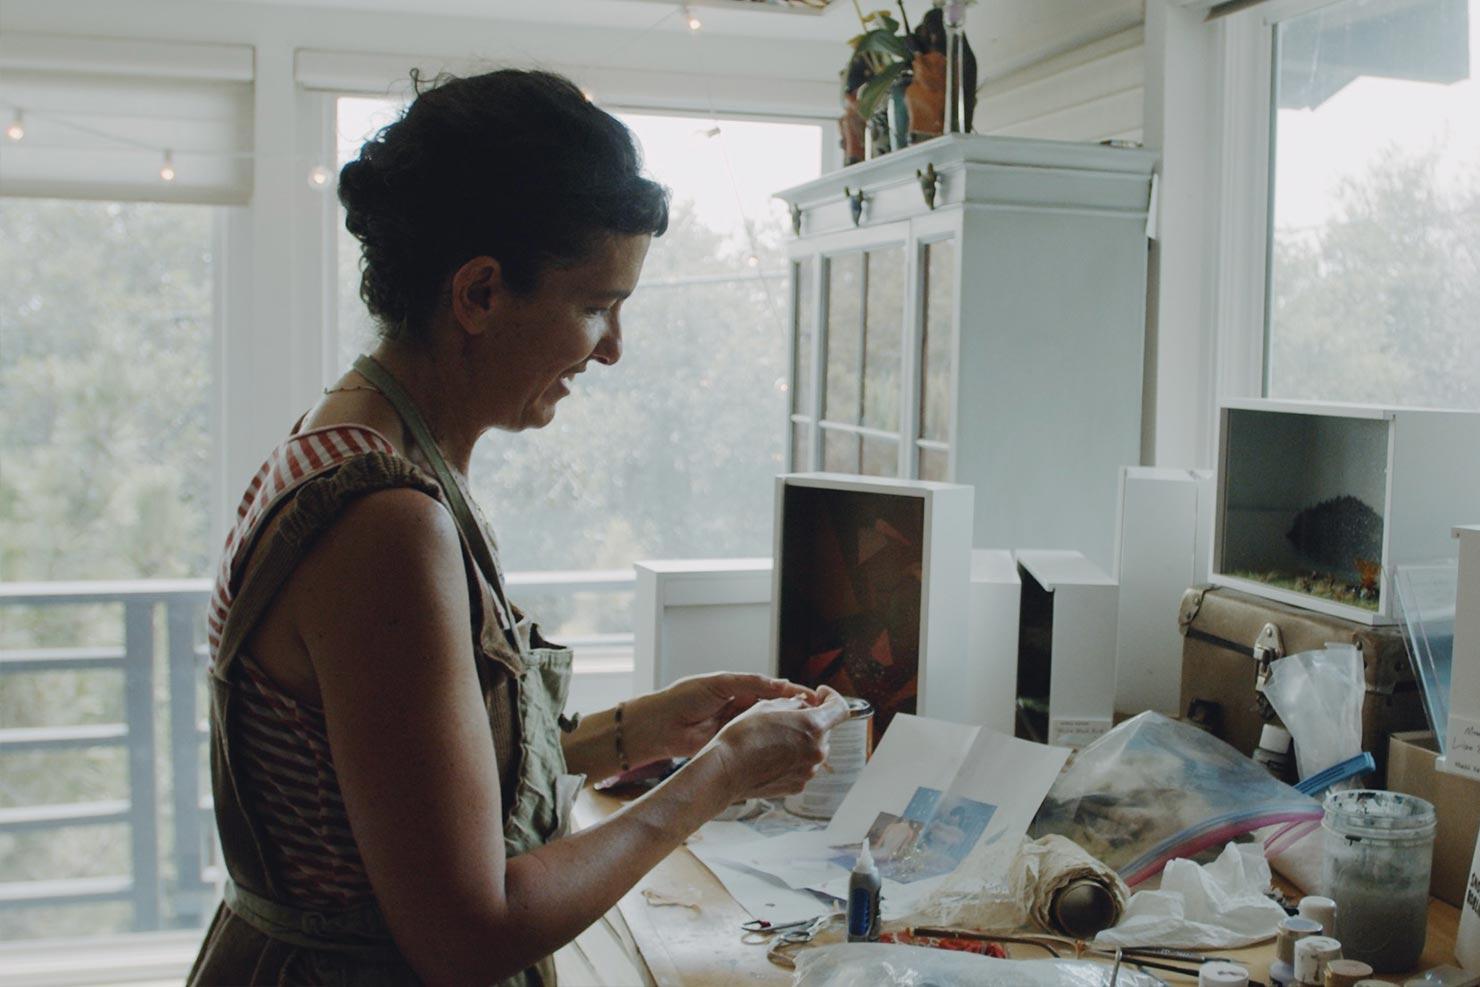 Last Lemon's Lisa Swerling working at her home studio in California